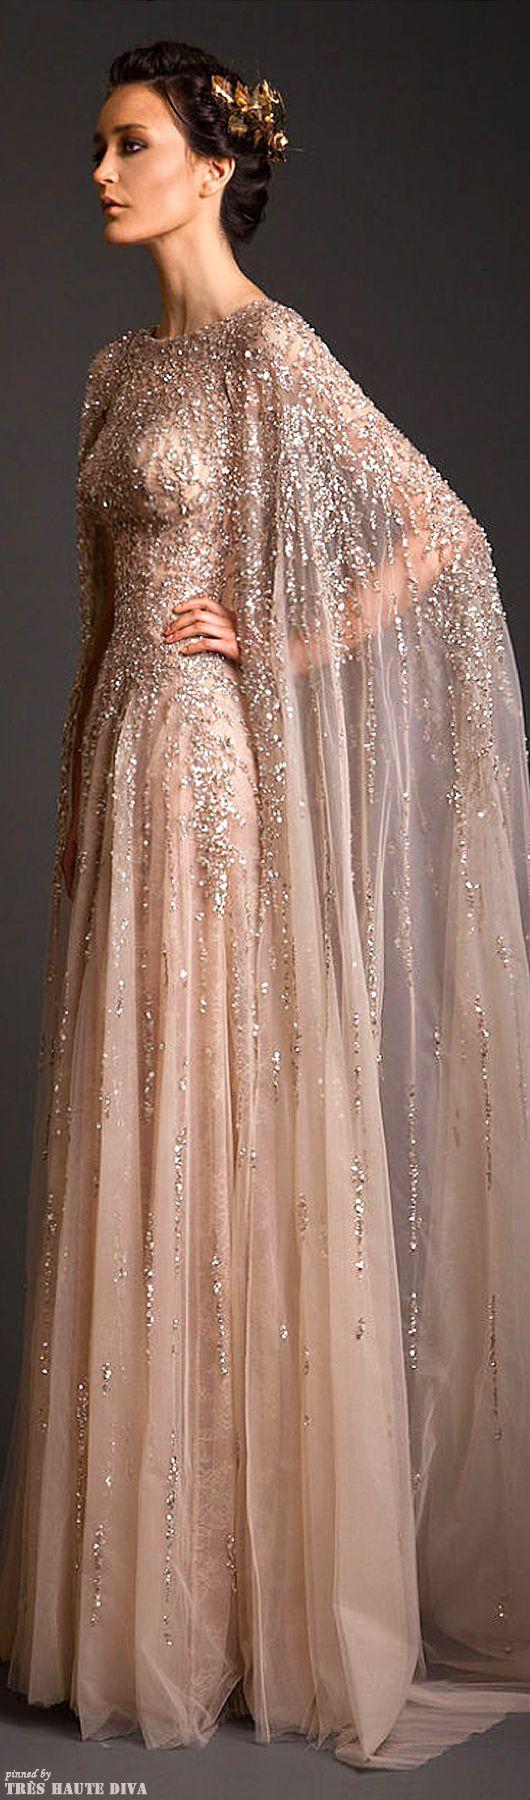 #Krikor Jabotian, Couture S/S 2014